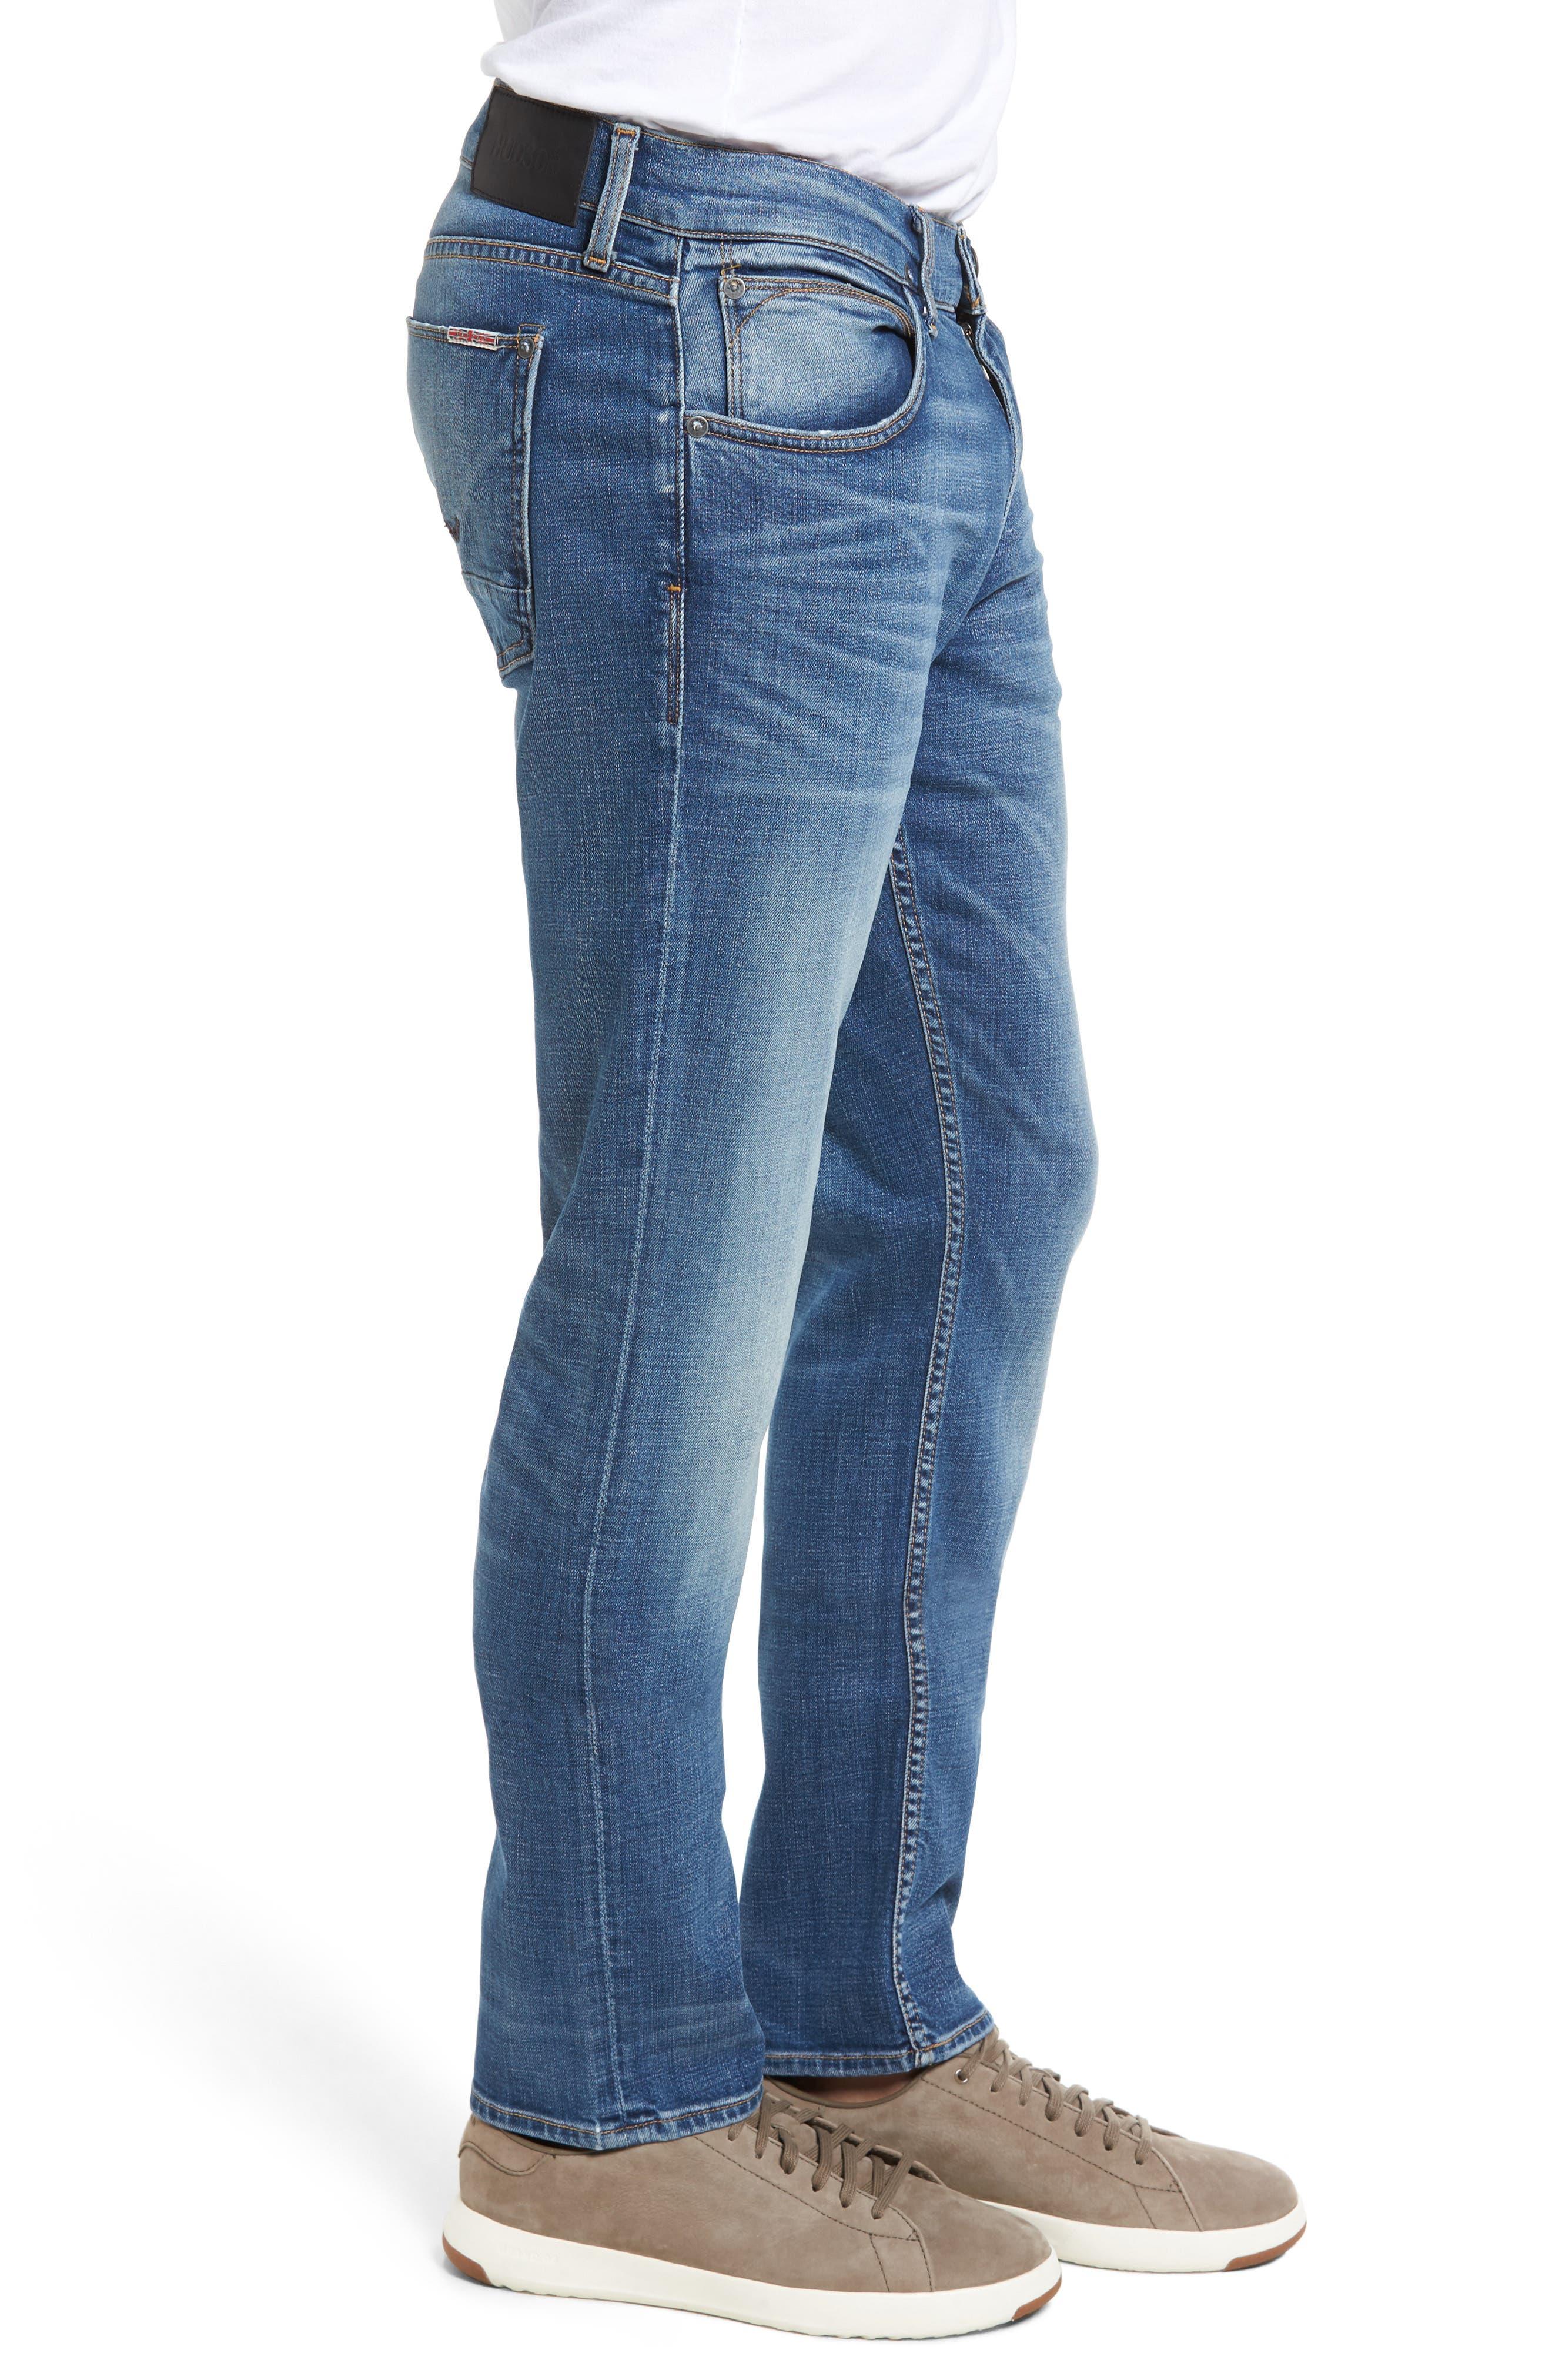 Blake Slim Fit Jeans,                             Alternate thumbnail 3, color,                             453